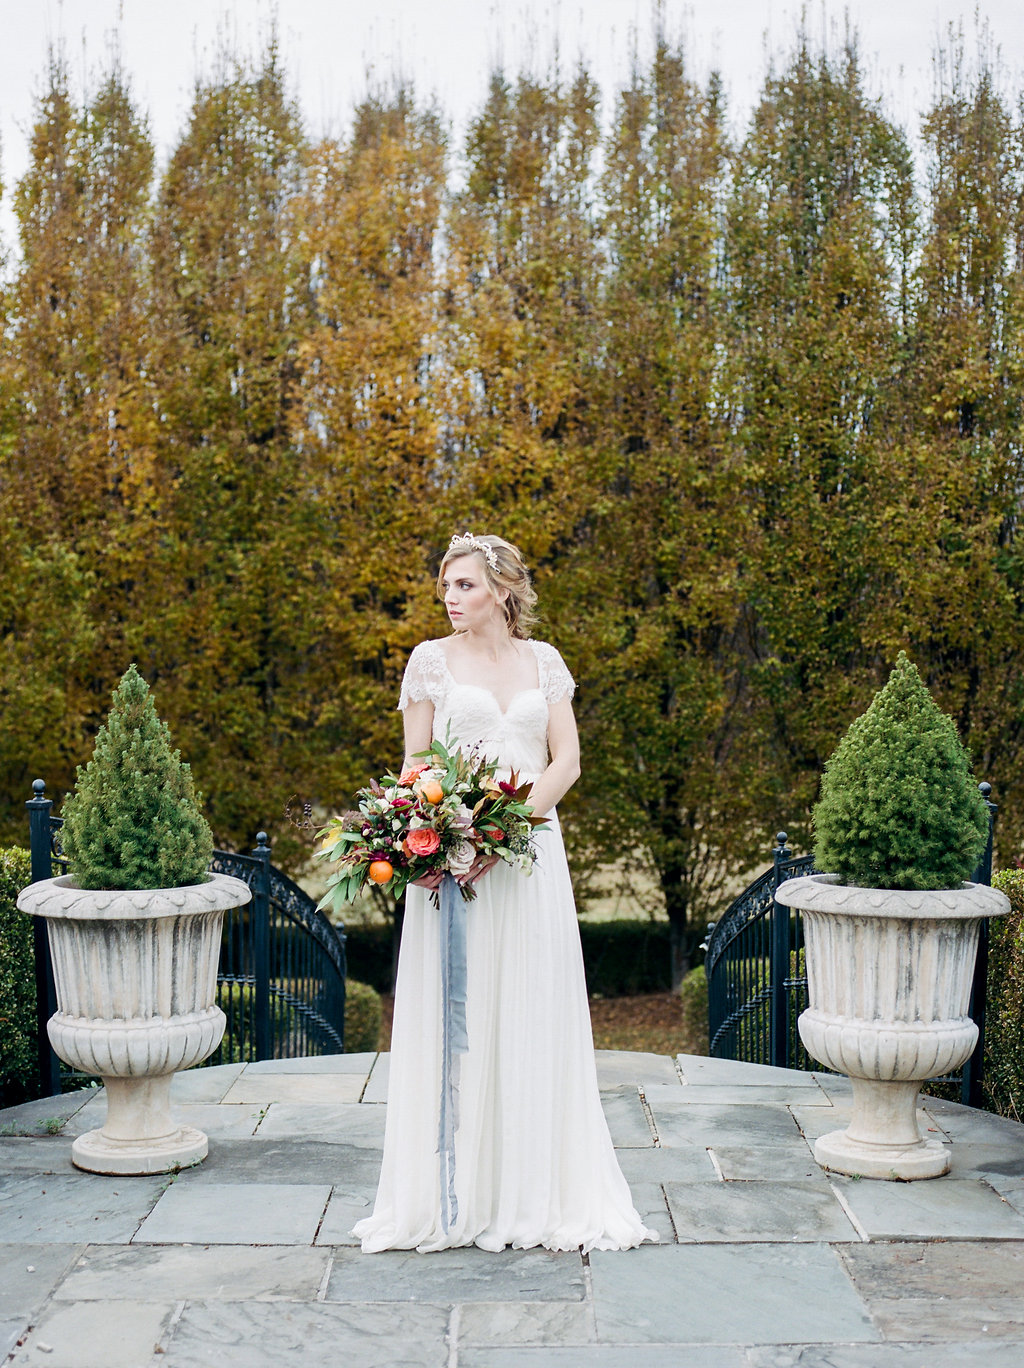 bridal fashion - photo by Lissa Ryan Photography http://ruffledblog.com/modern-romantic-wedding-ideas-with-family-heirlooms